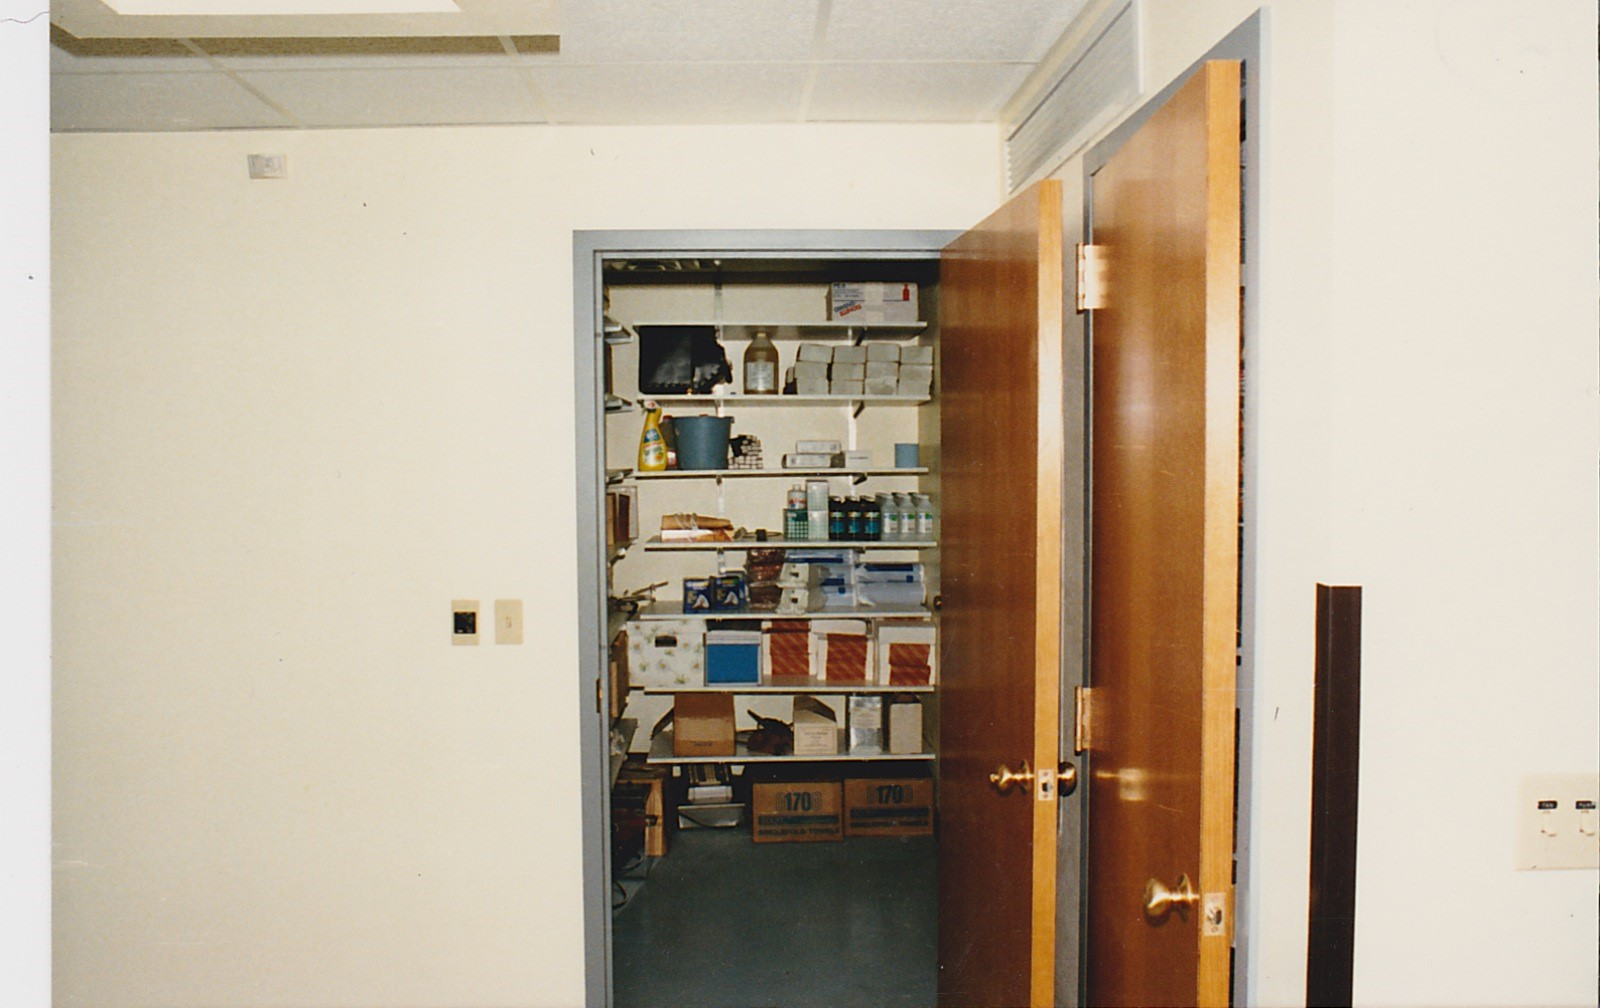 Pharmacy and equipment storage room